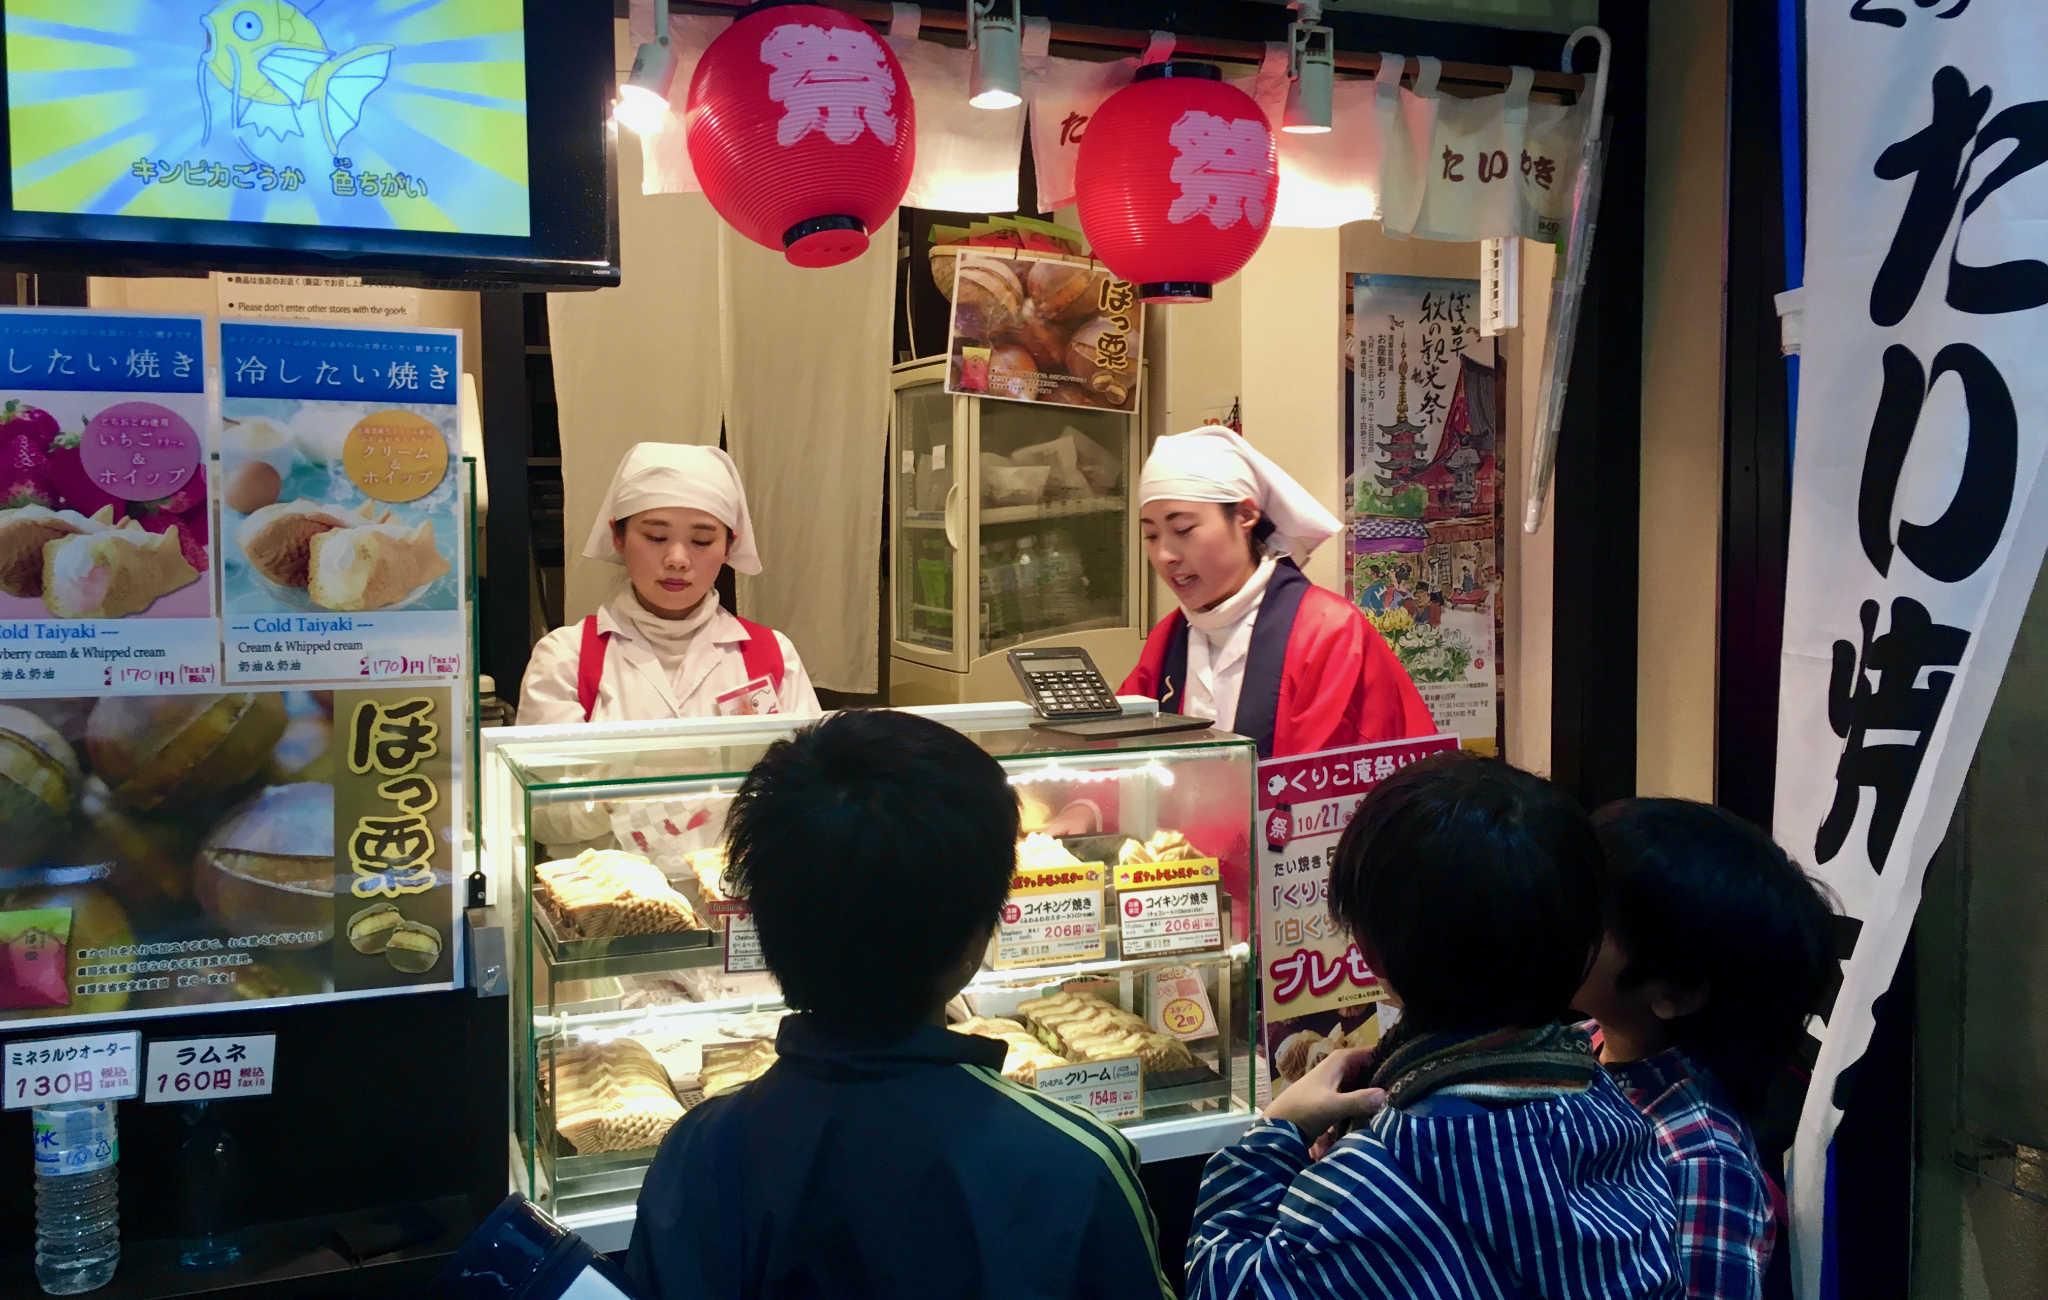 Vendeur de Taiyaki à Tokyo